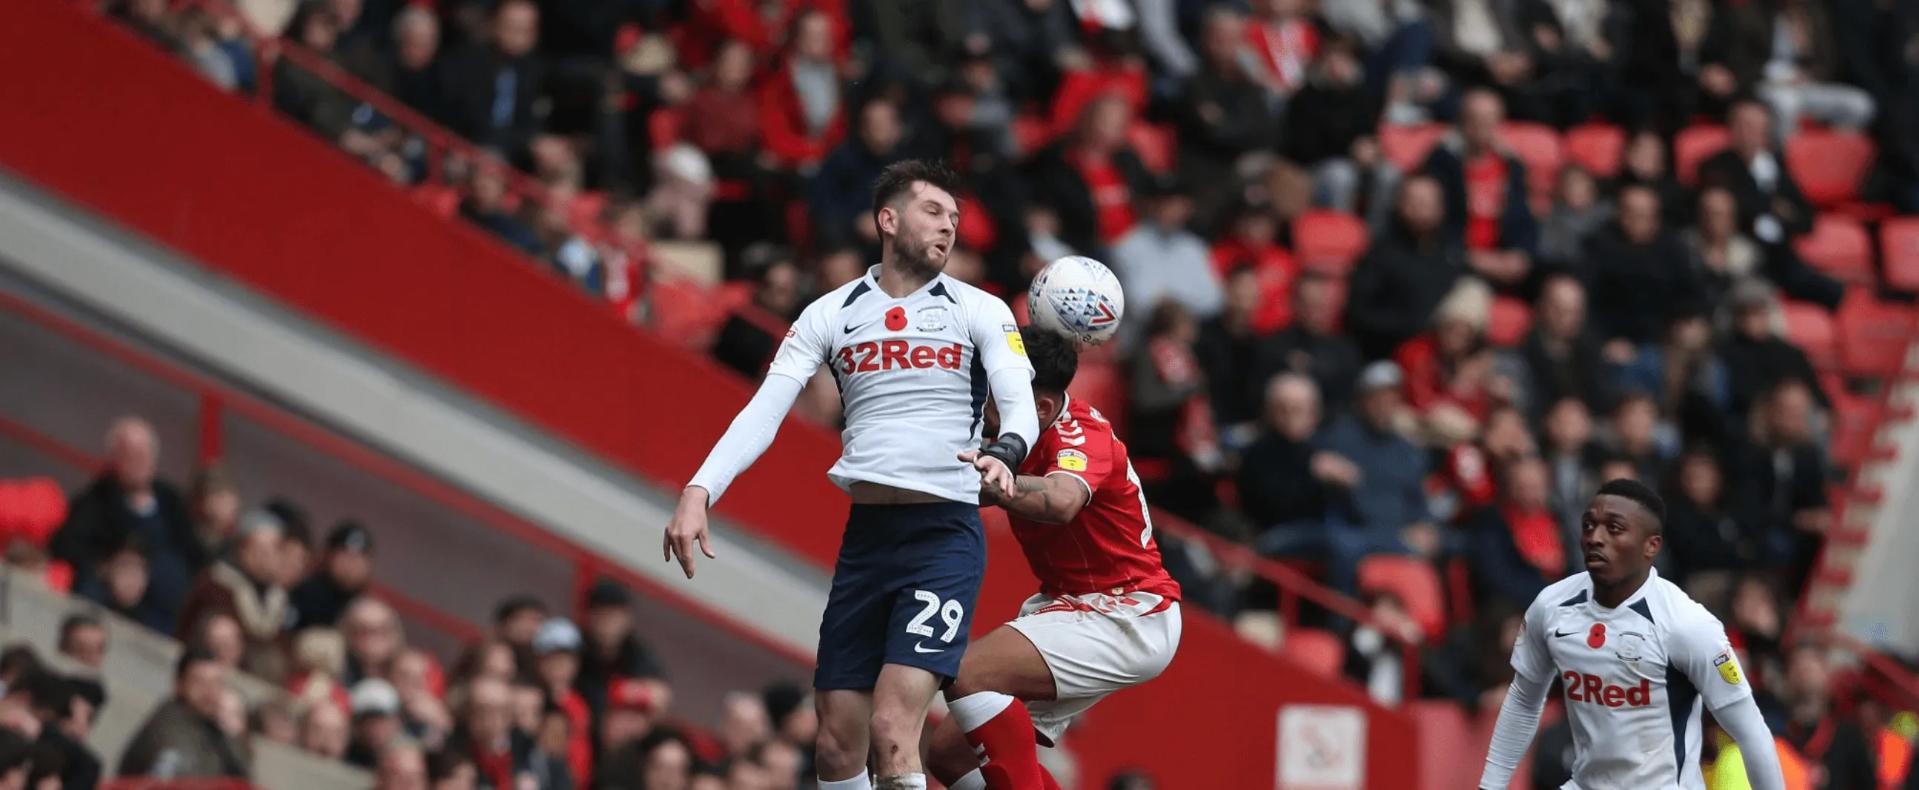 Preston North End vs Charlton